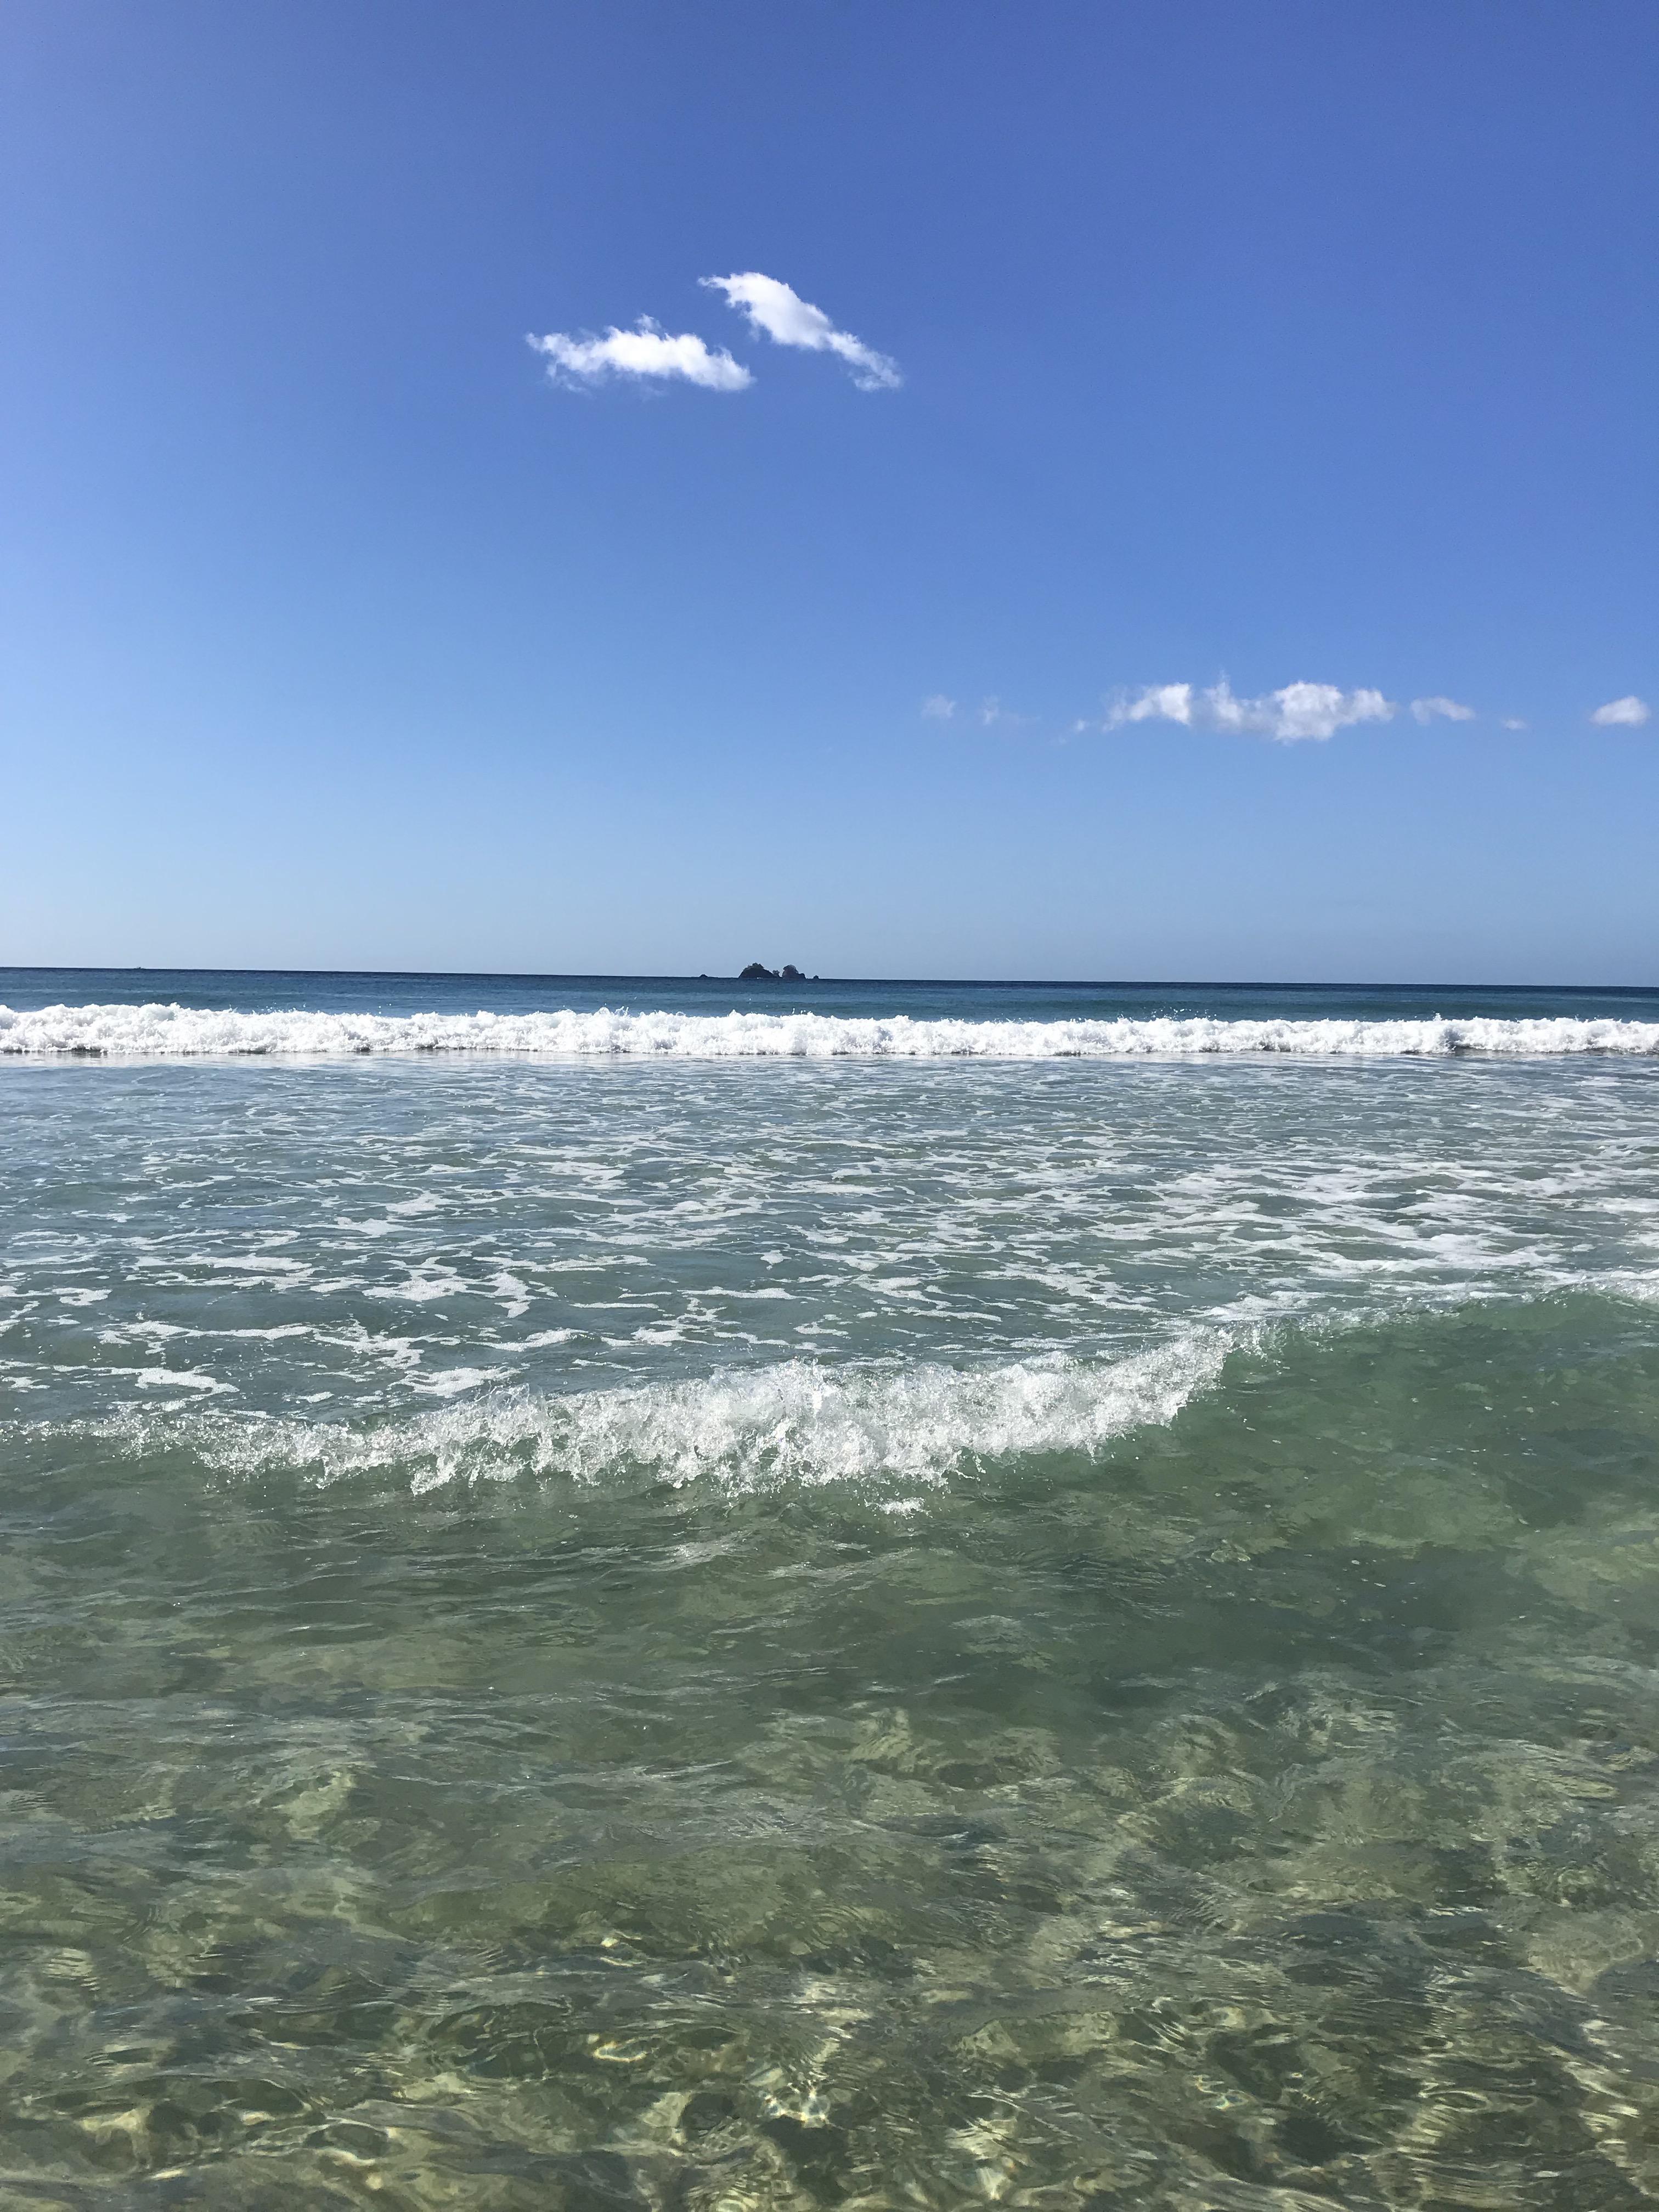 acqua-mare-nagtabon-beach-palawan